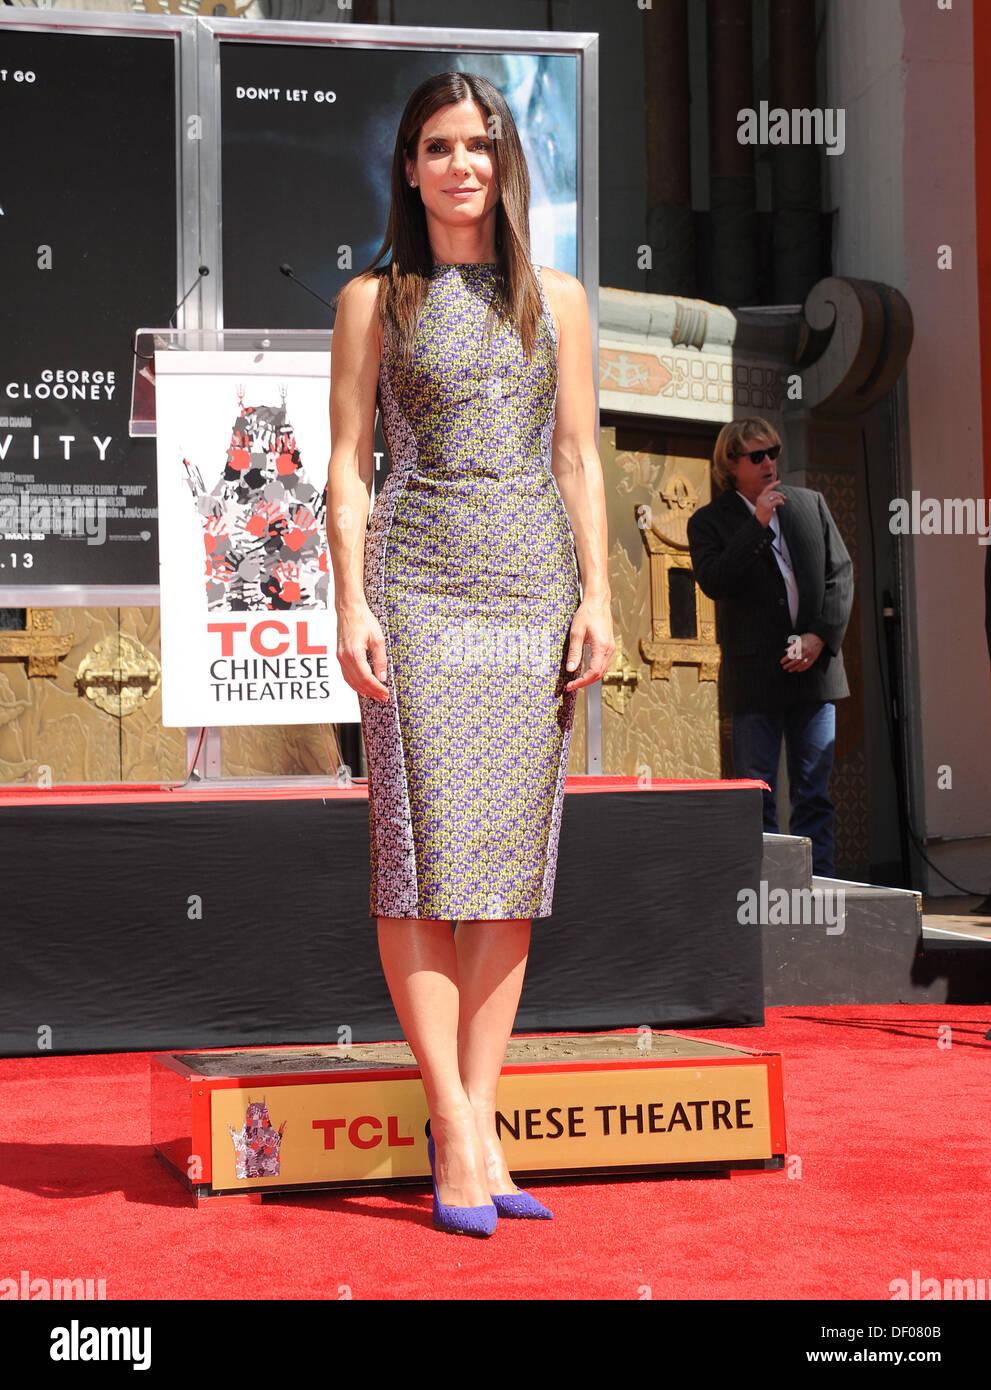 Jennifer Finnigan Feet hollywood, california, usa. 25th sep, 2013. sandra bullock